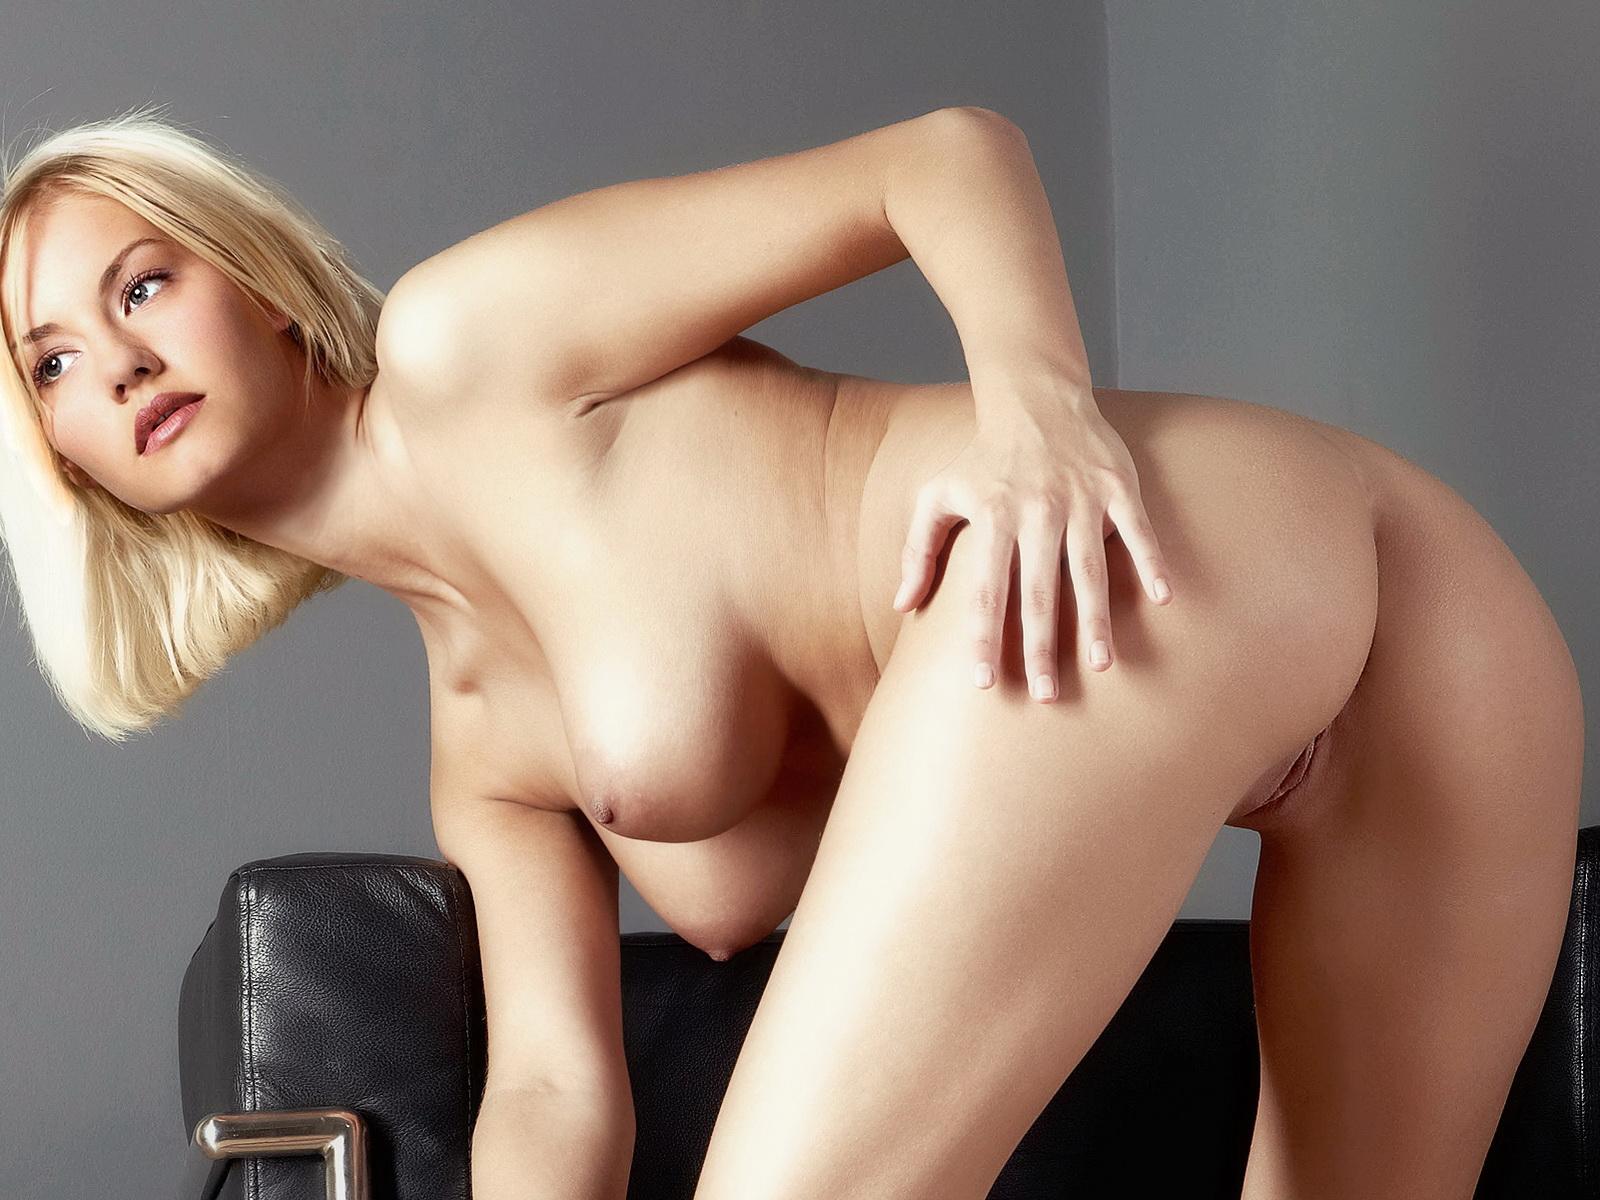 Naked Pics Of Elisha Cuthbert 57